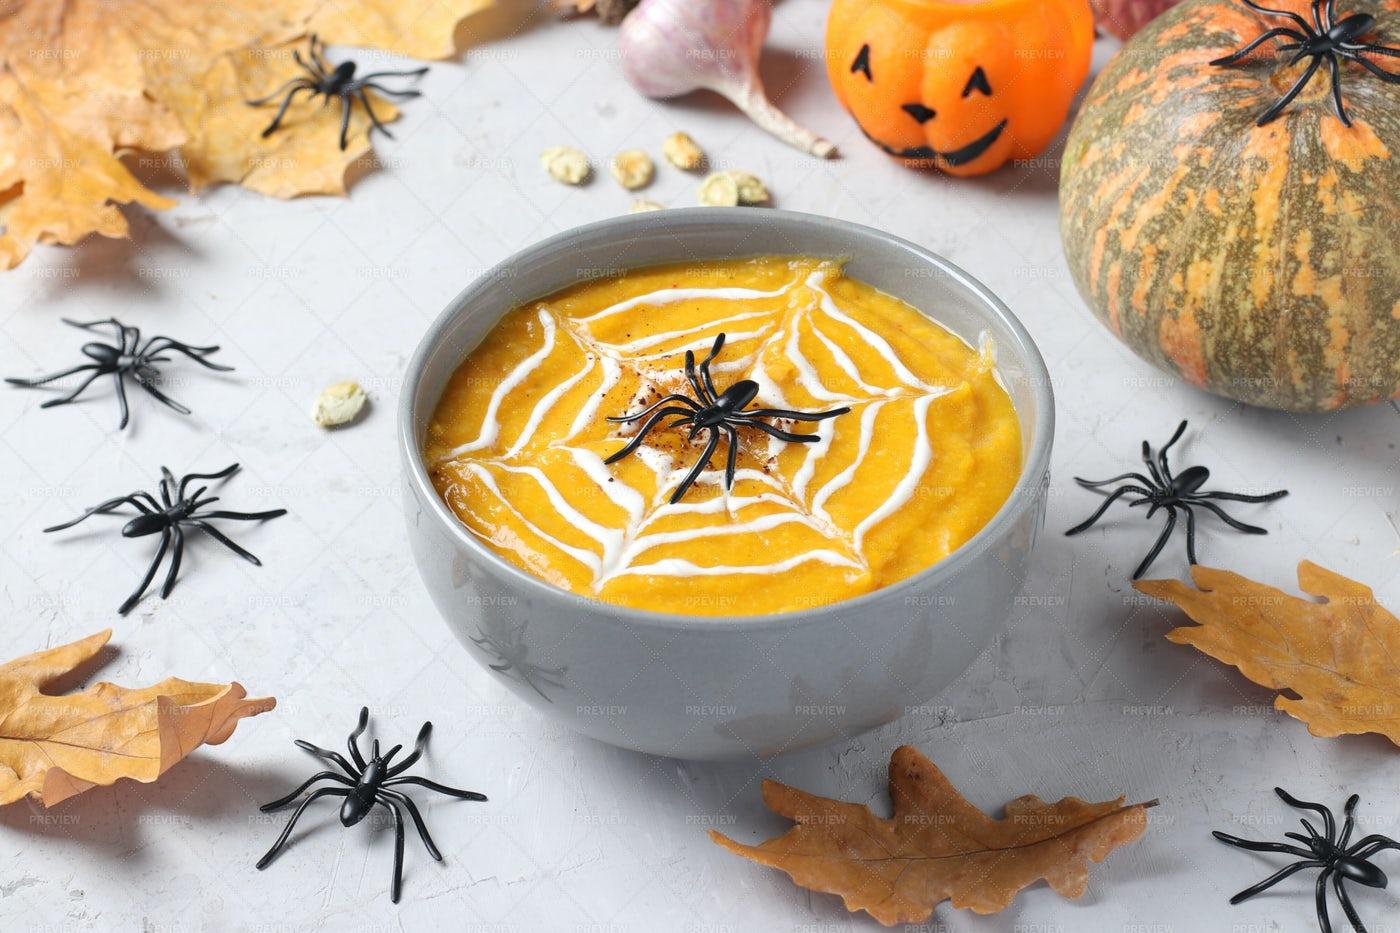 Halloween Pumpkin Soup With Spiders: Stock Photos